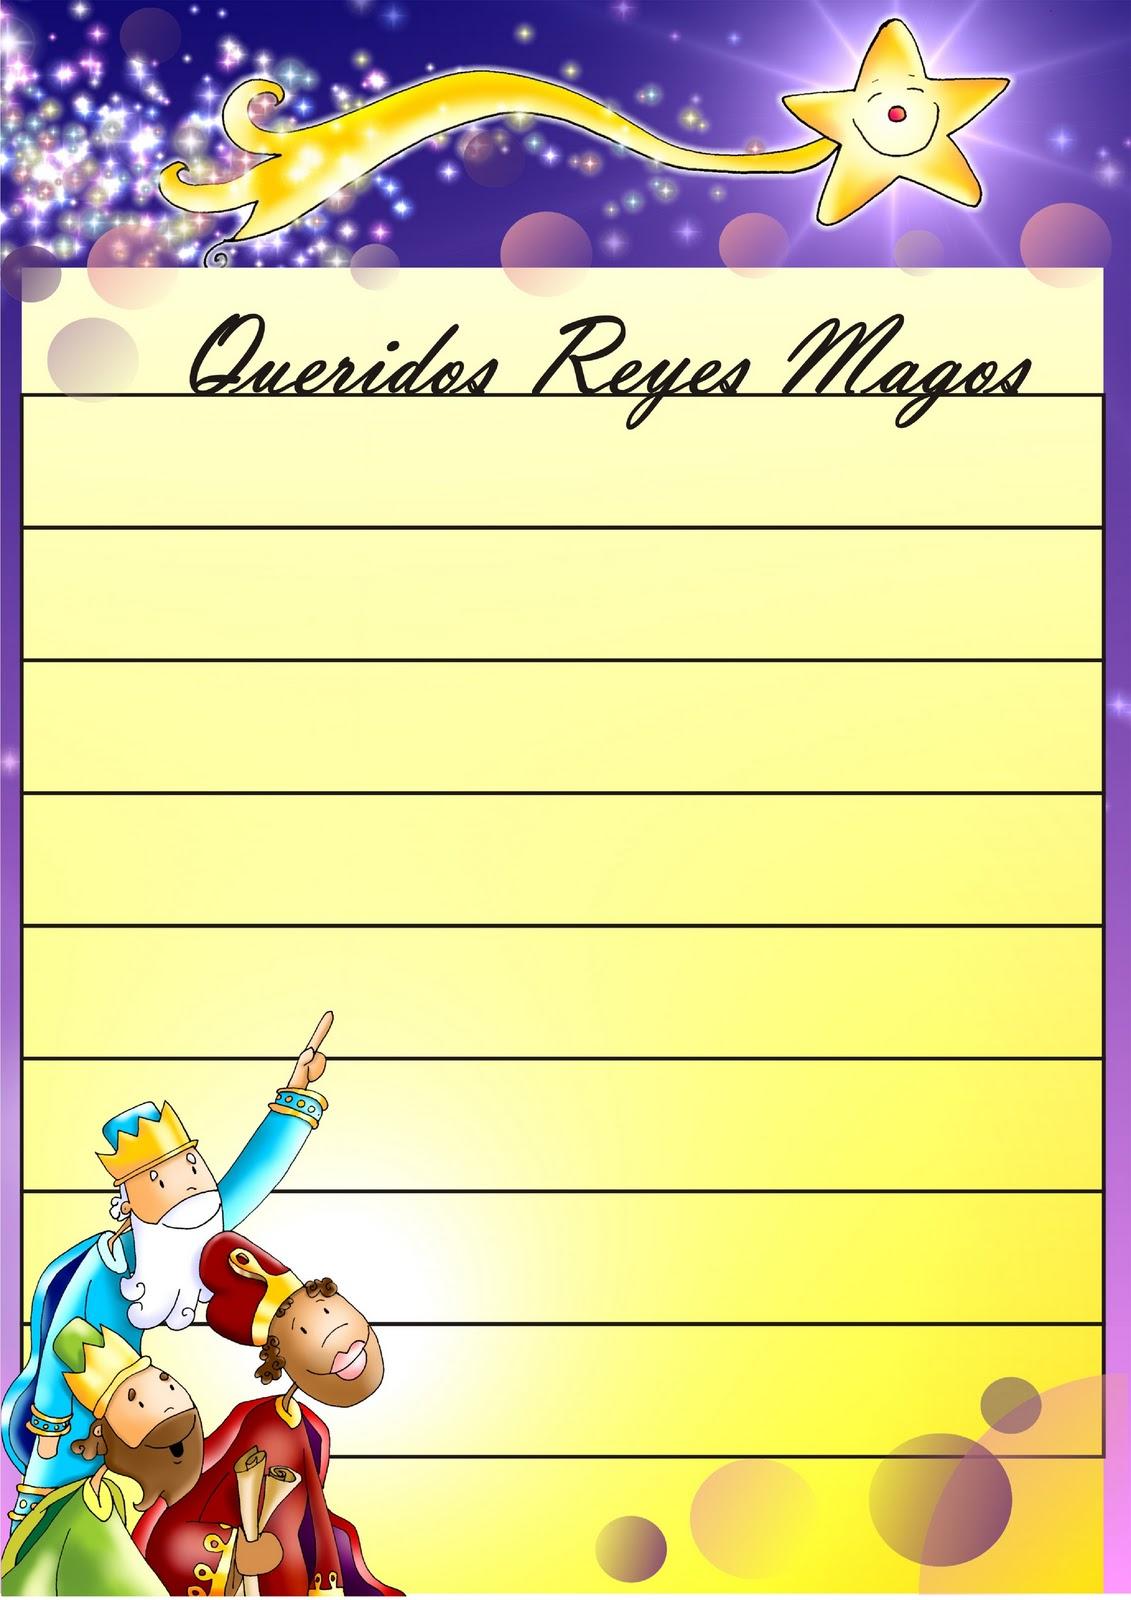 Recursos para mi clase: Carta Reyes Magos